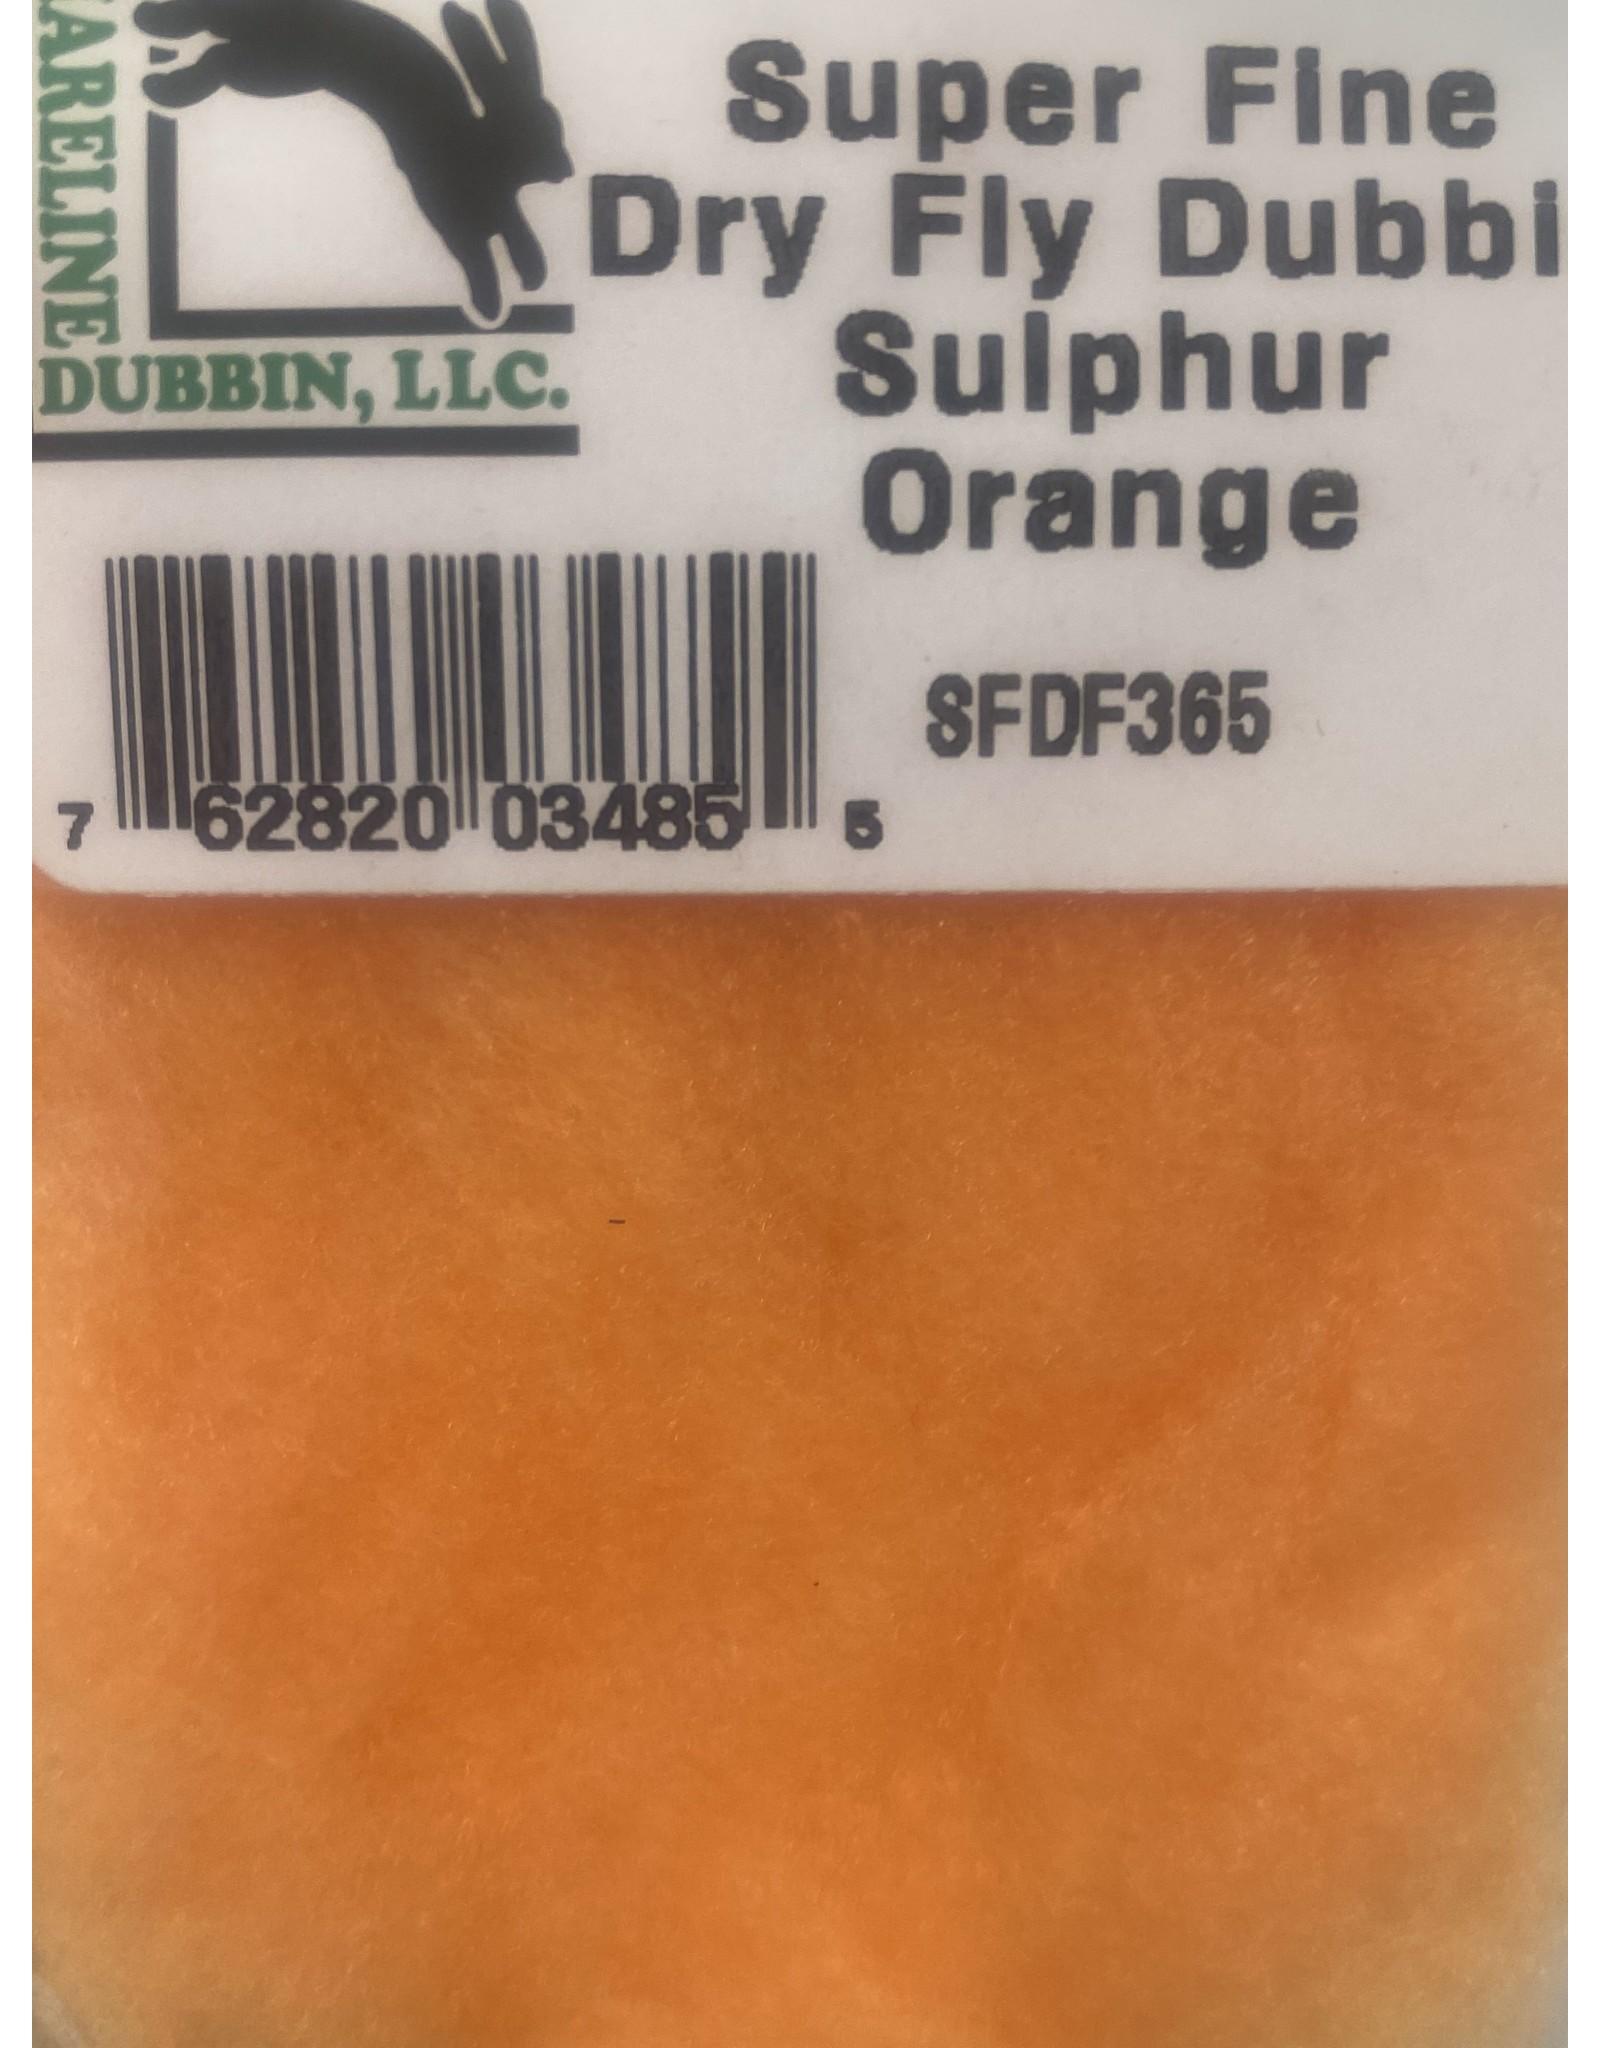 Hareline Superfine - Sulphur Orange SFDF365